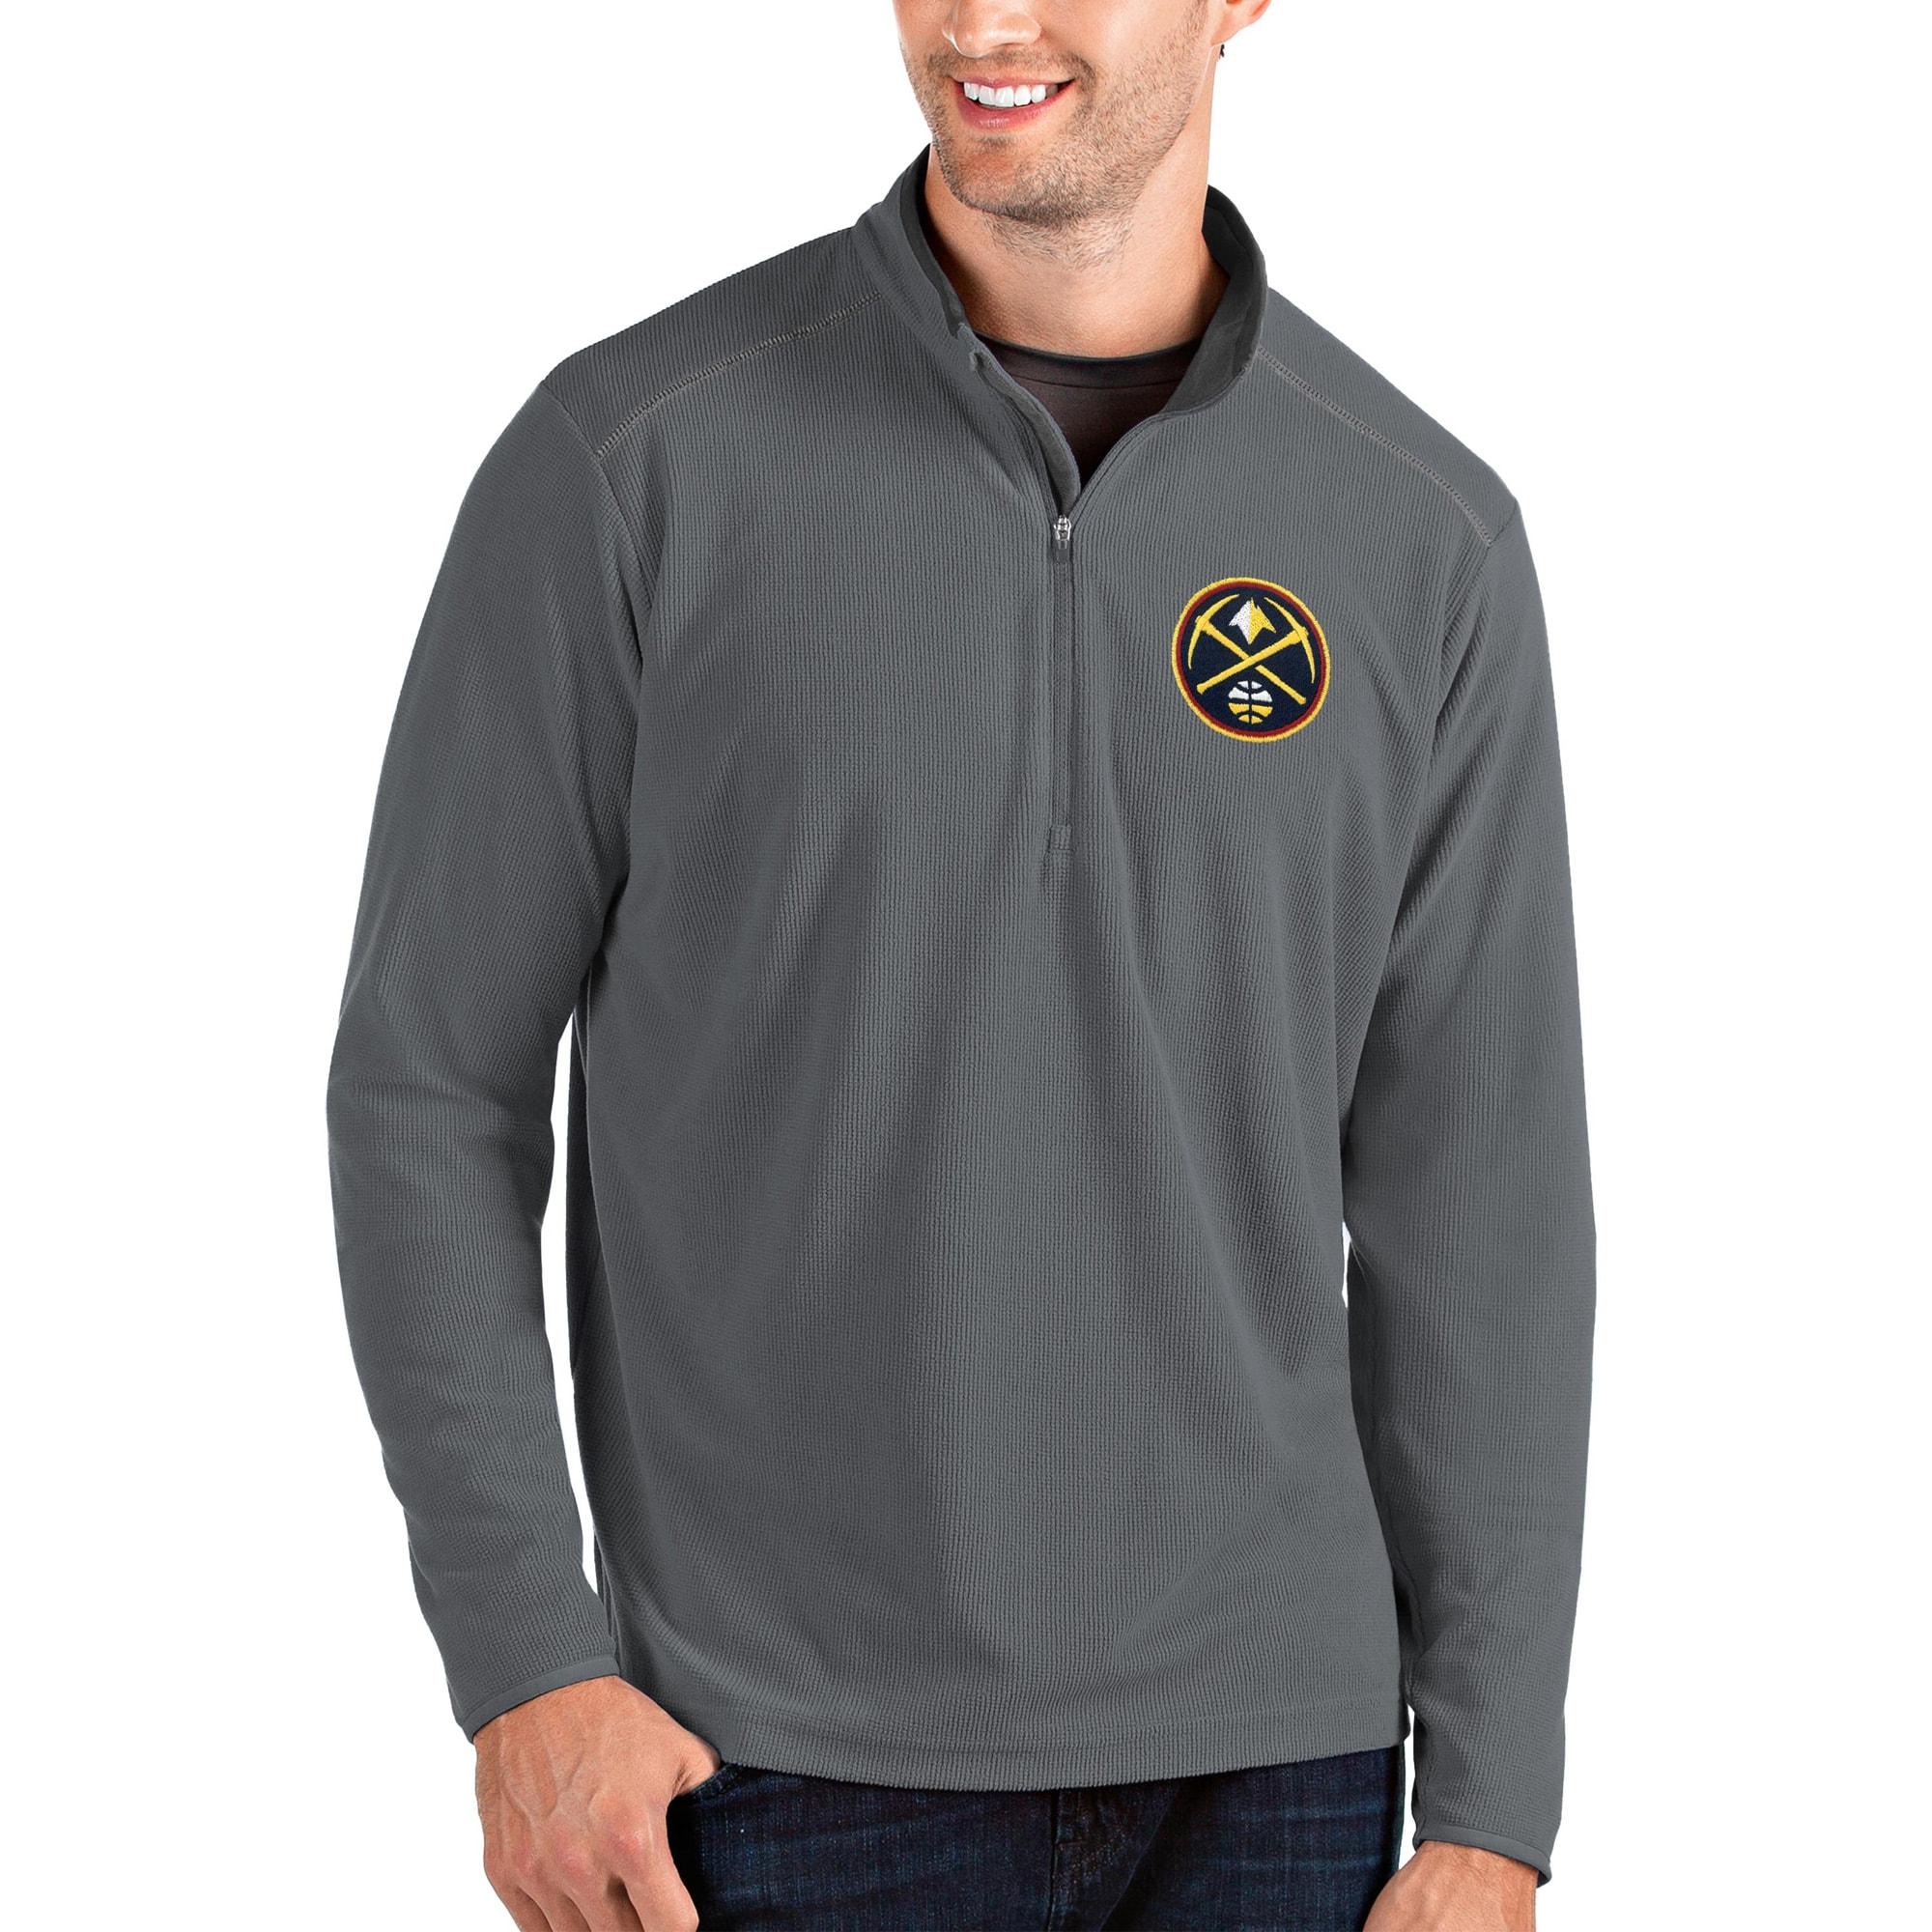 Denver Nuggets Antigua Glacier Quarter-Zip Pullover Jacket - Charcoal/Gray